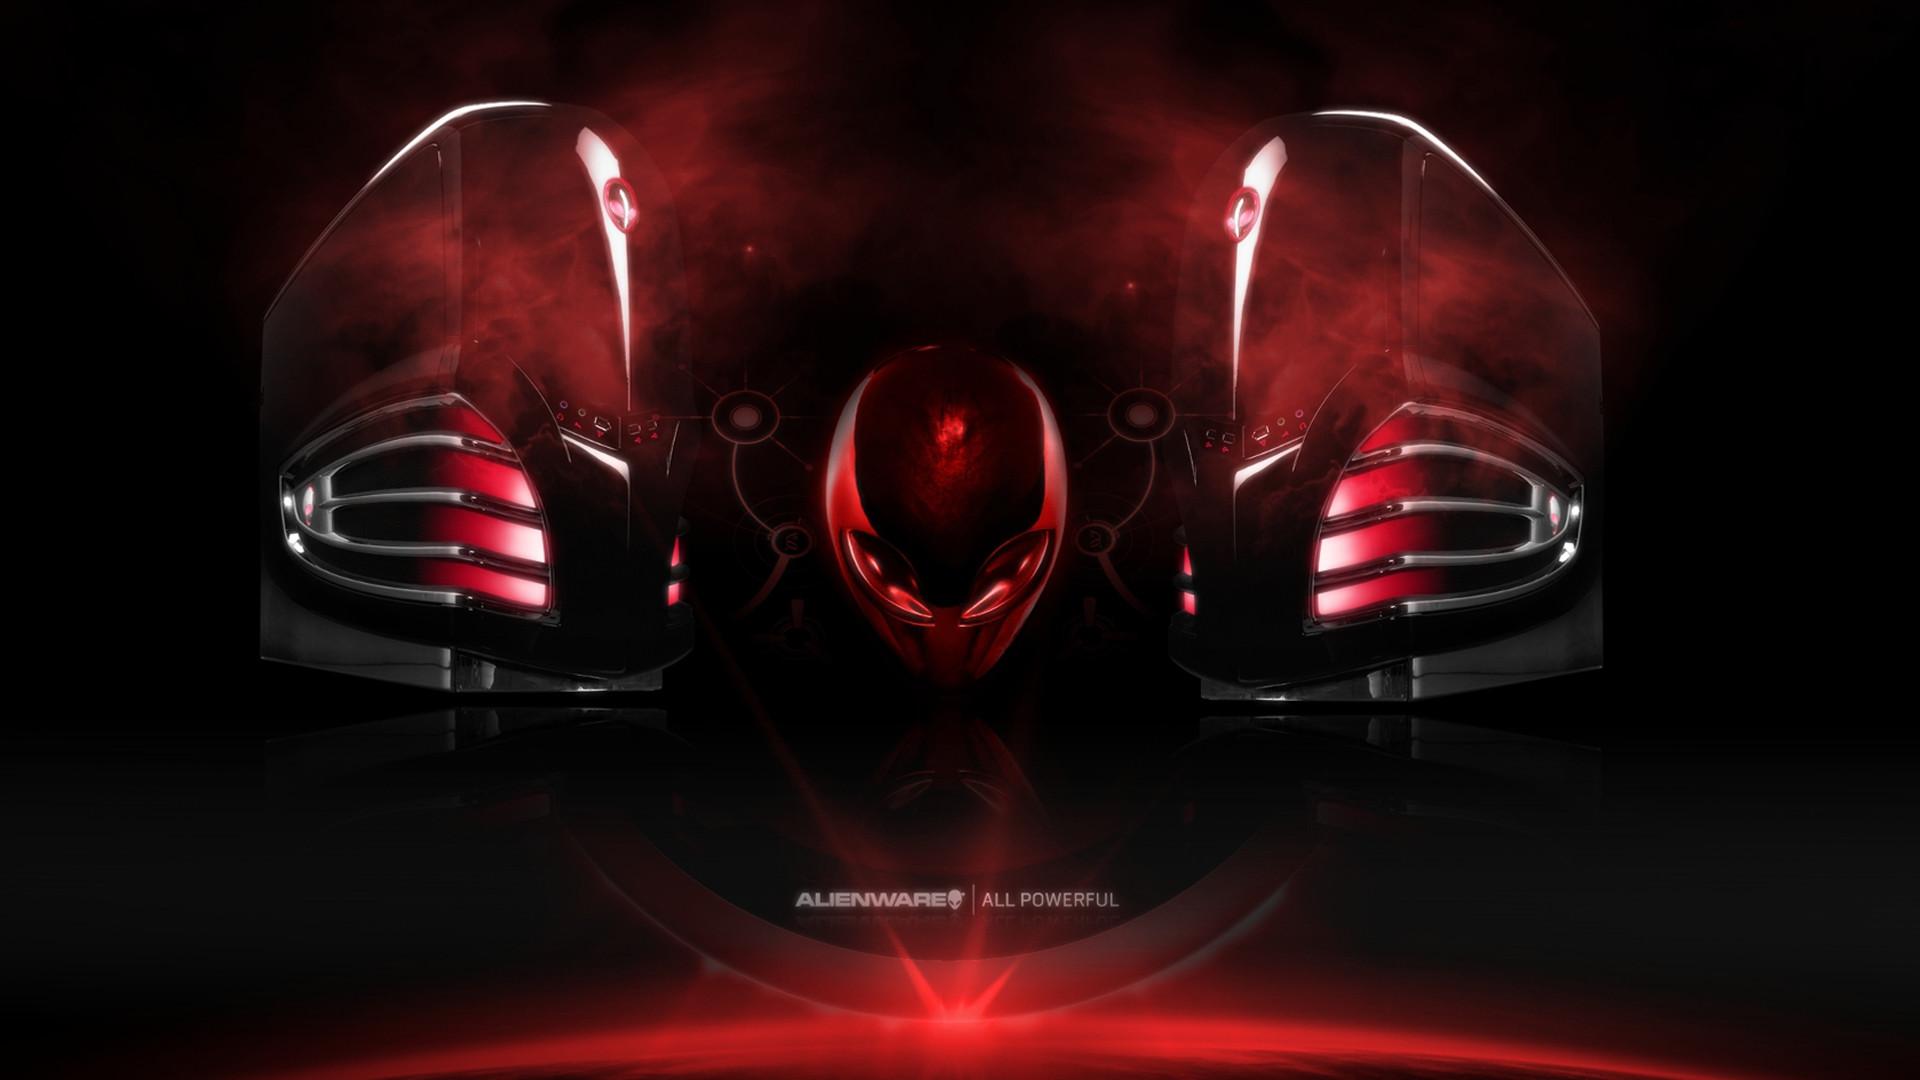 Res: 1920x1080, alienware dark red logo hd